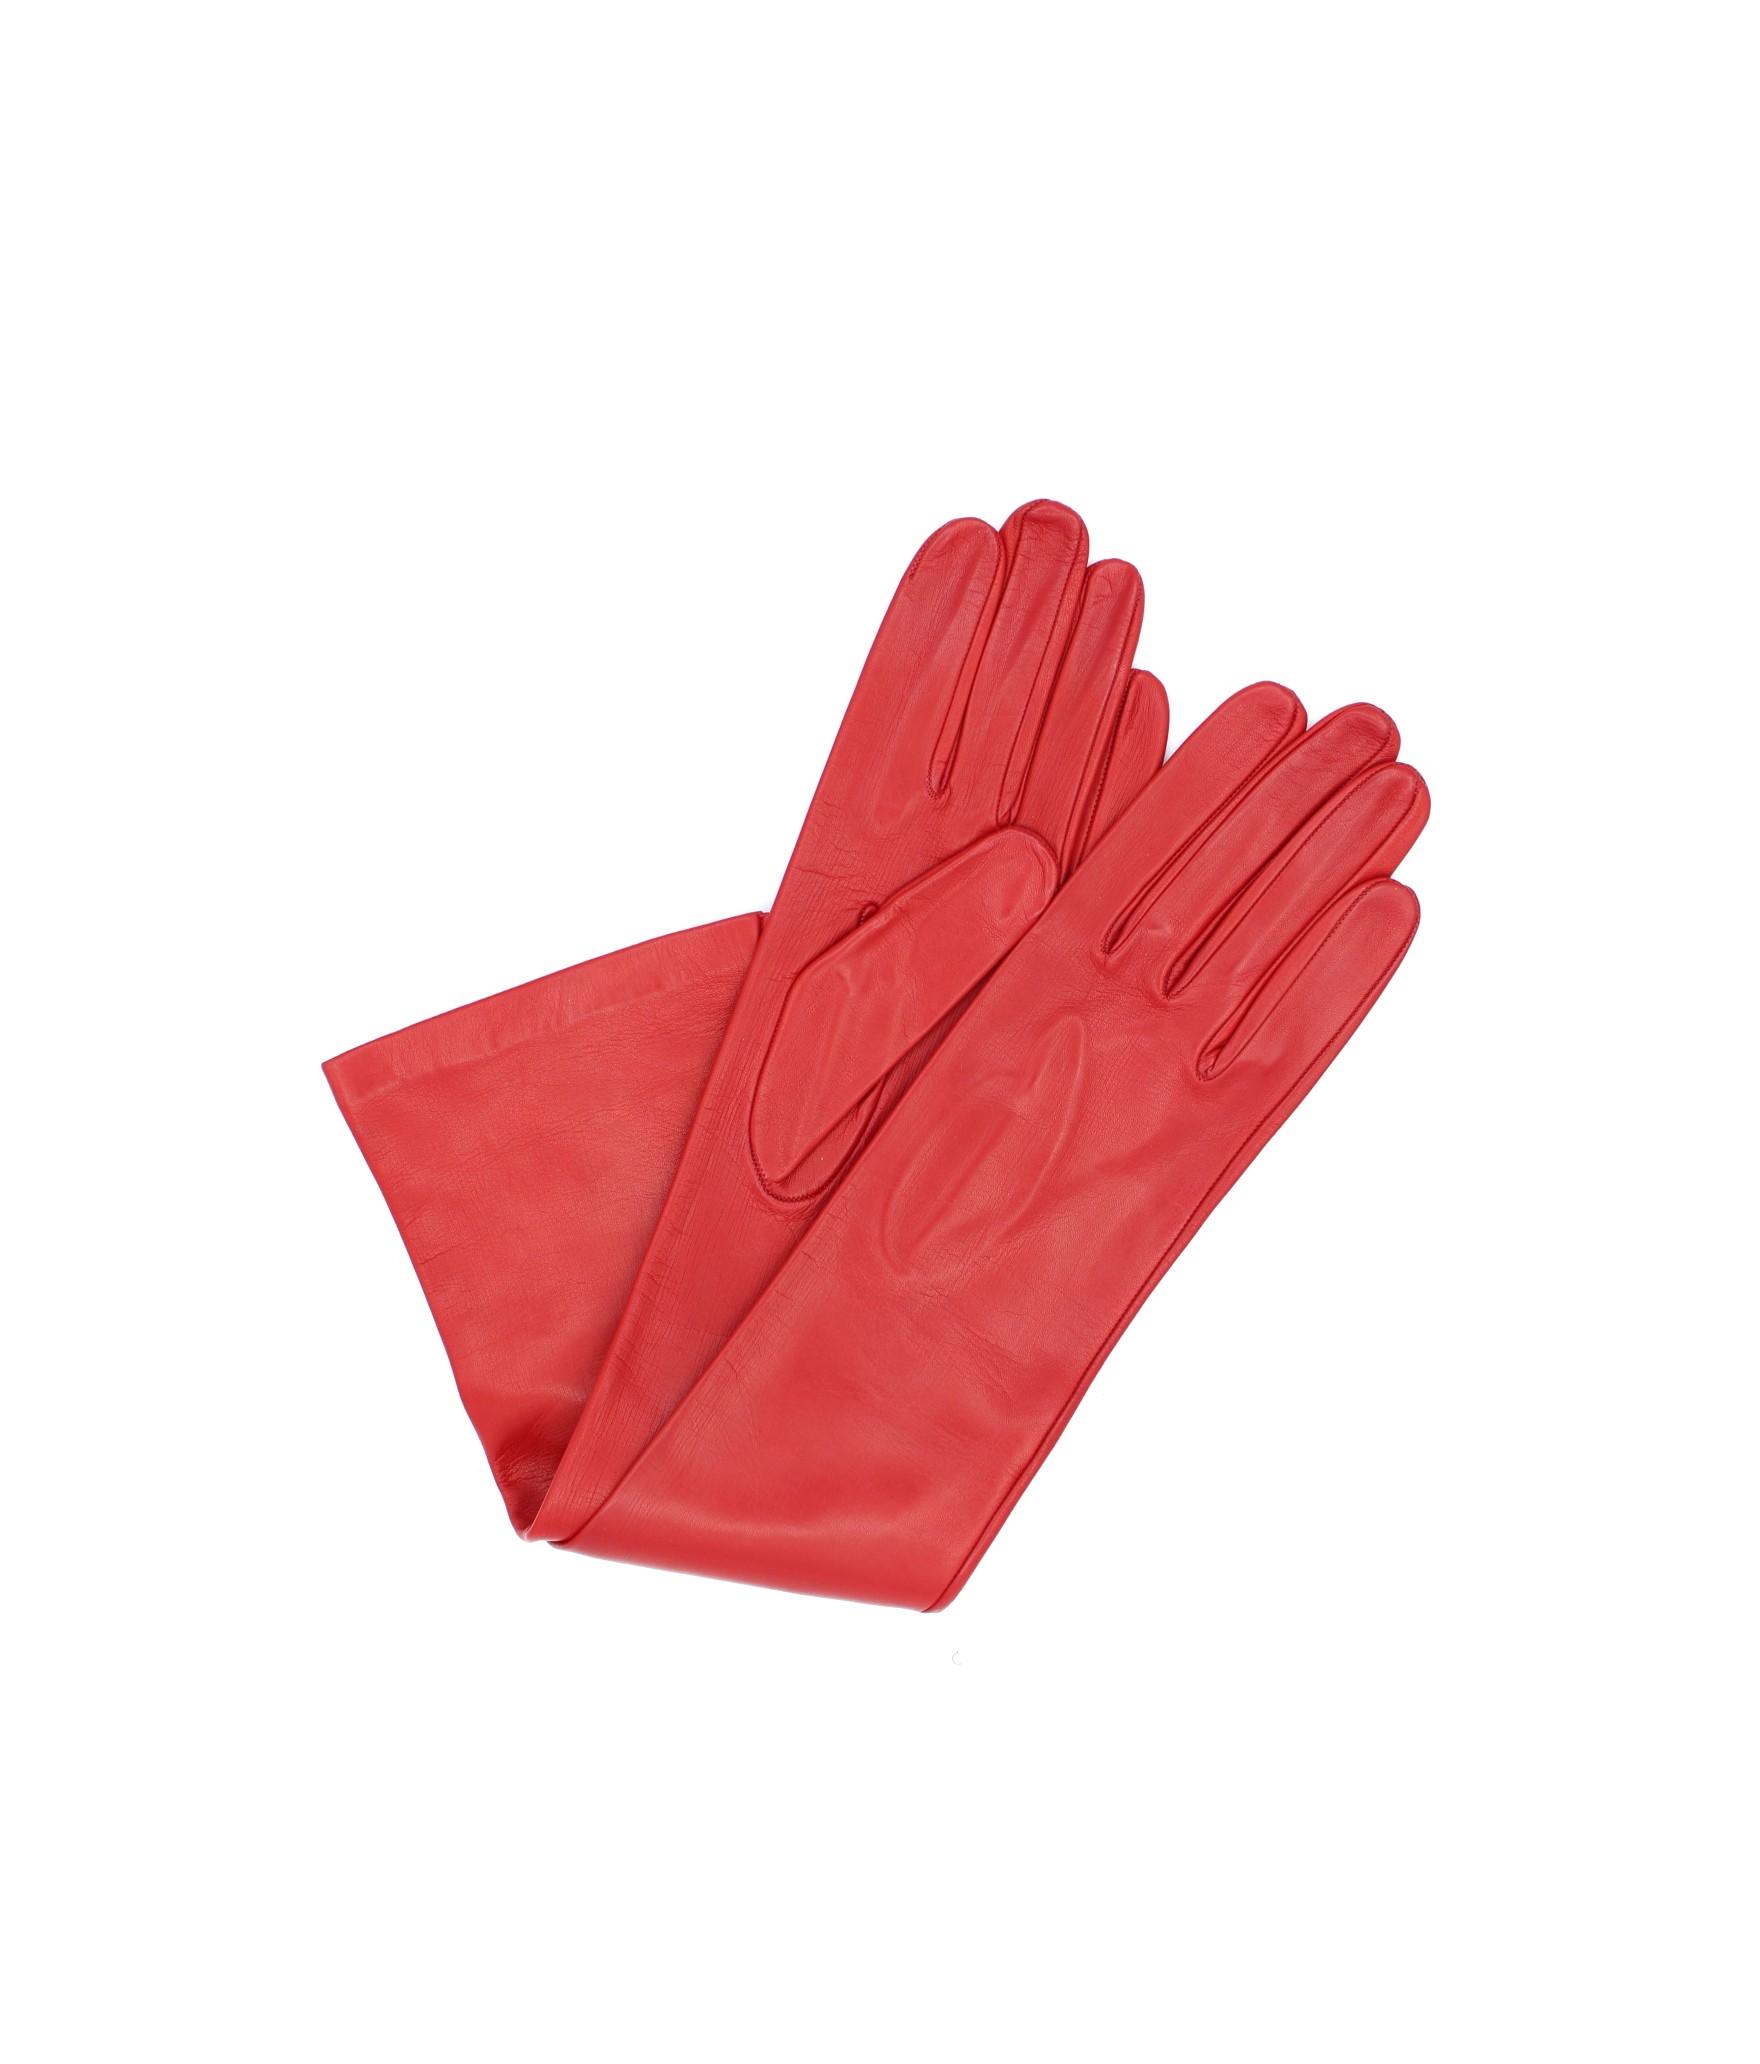 Nappa leather gloves 10bt silk lined Red Sermoneta Gloves